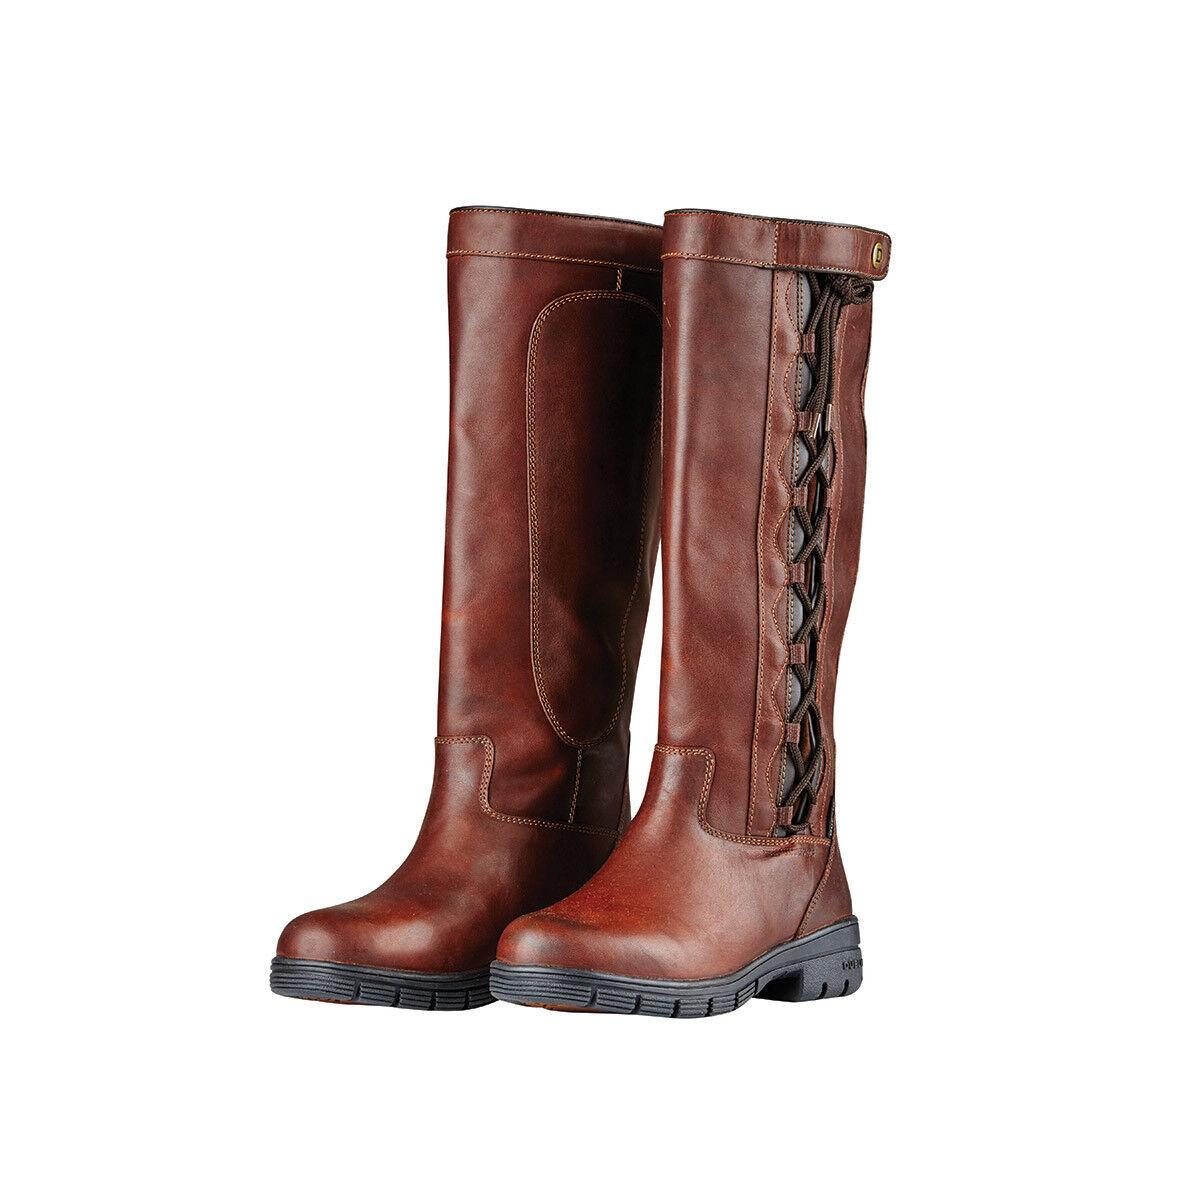 NEW Dublin Pinnacle Grain Boots - Red Brown - Various Sizes